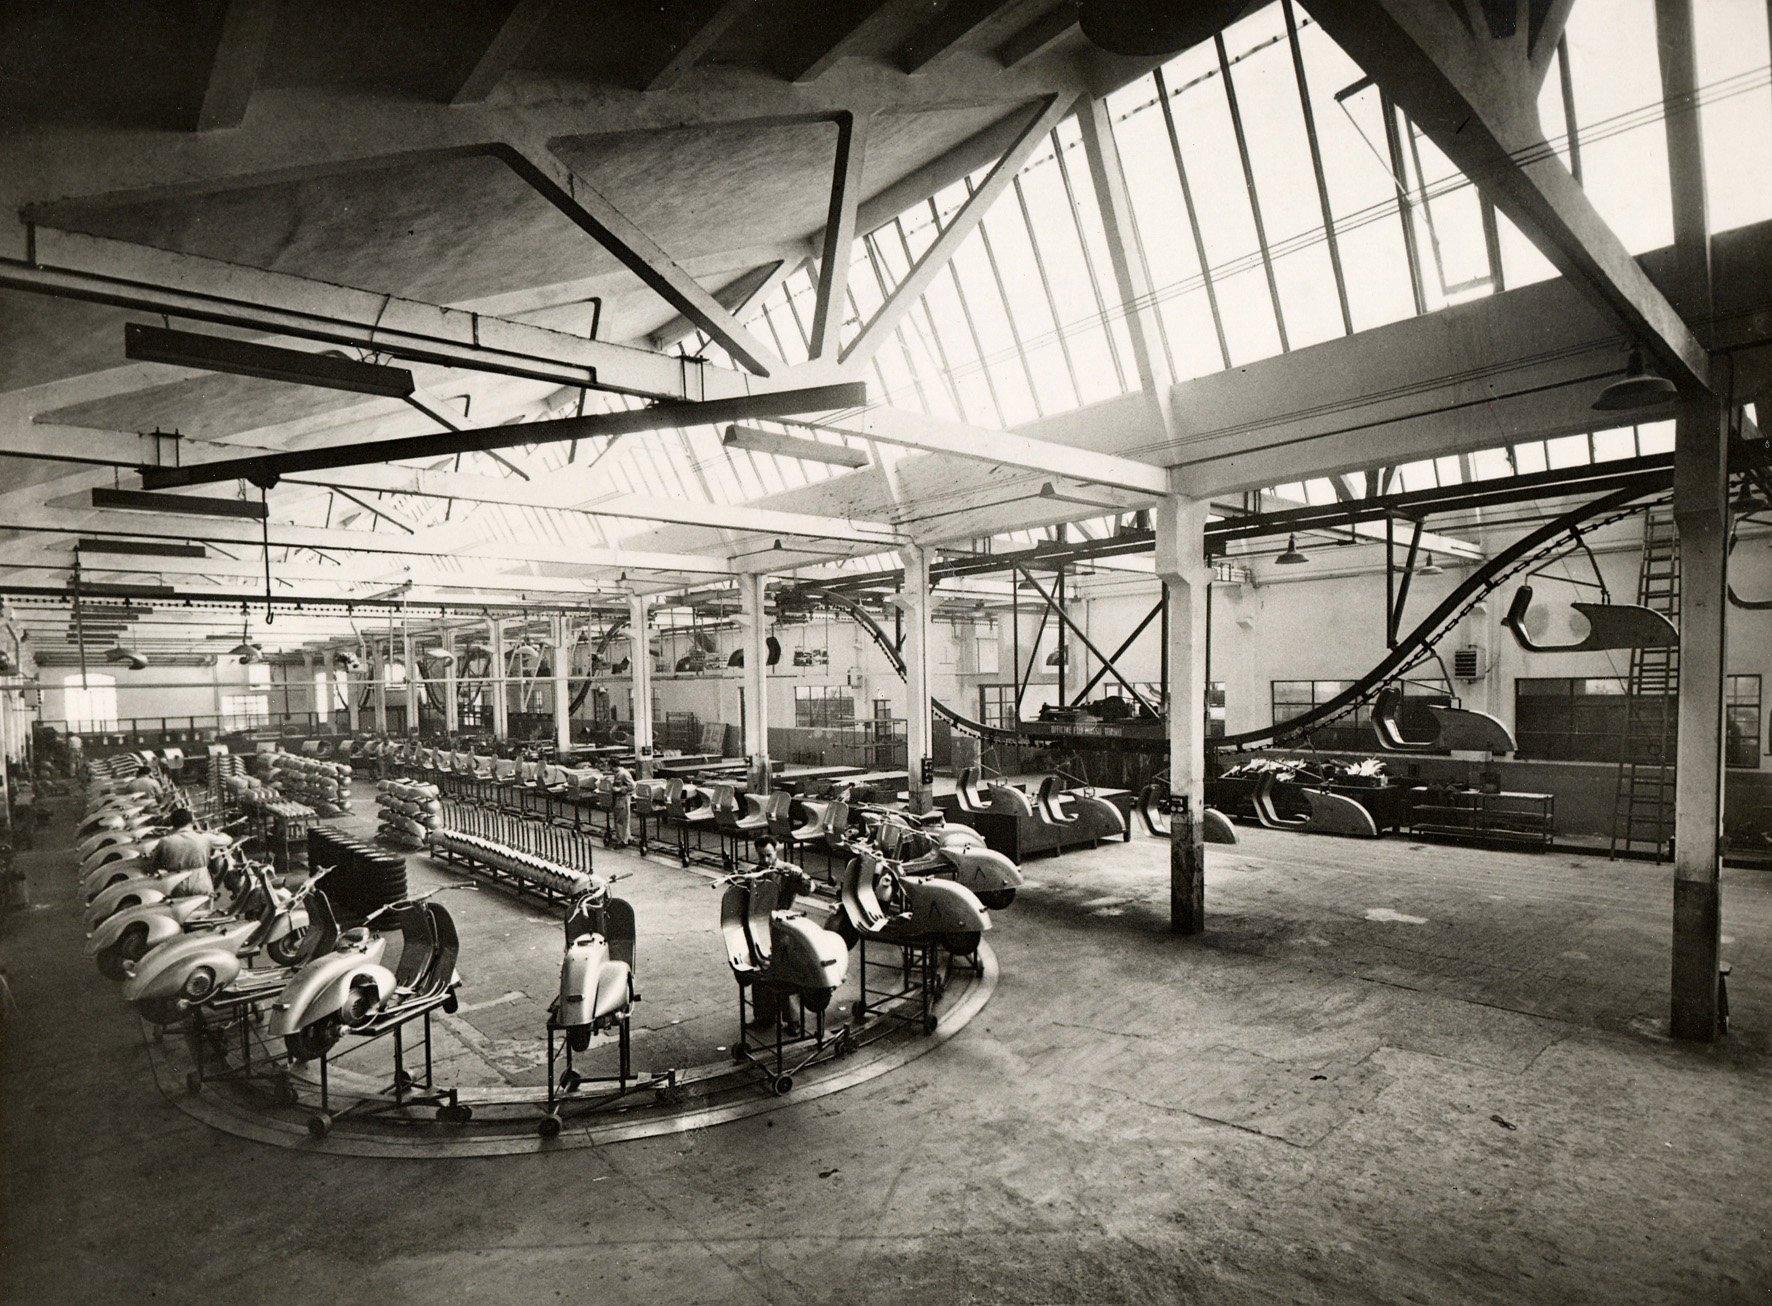 Produktion des Vespa-Rollers 1950 in der Vespa-Fabrik in Pontedera in der Toskana.